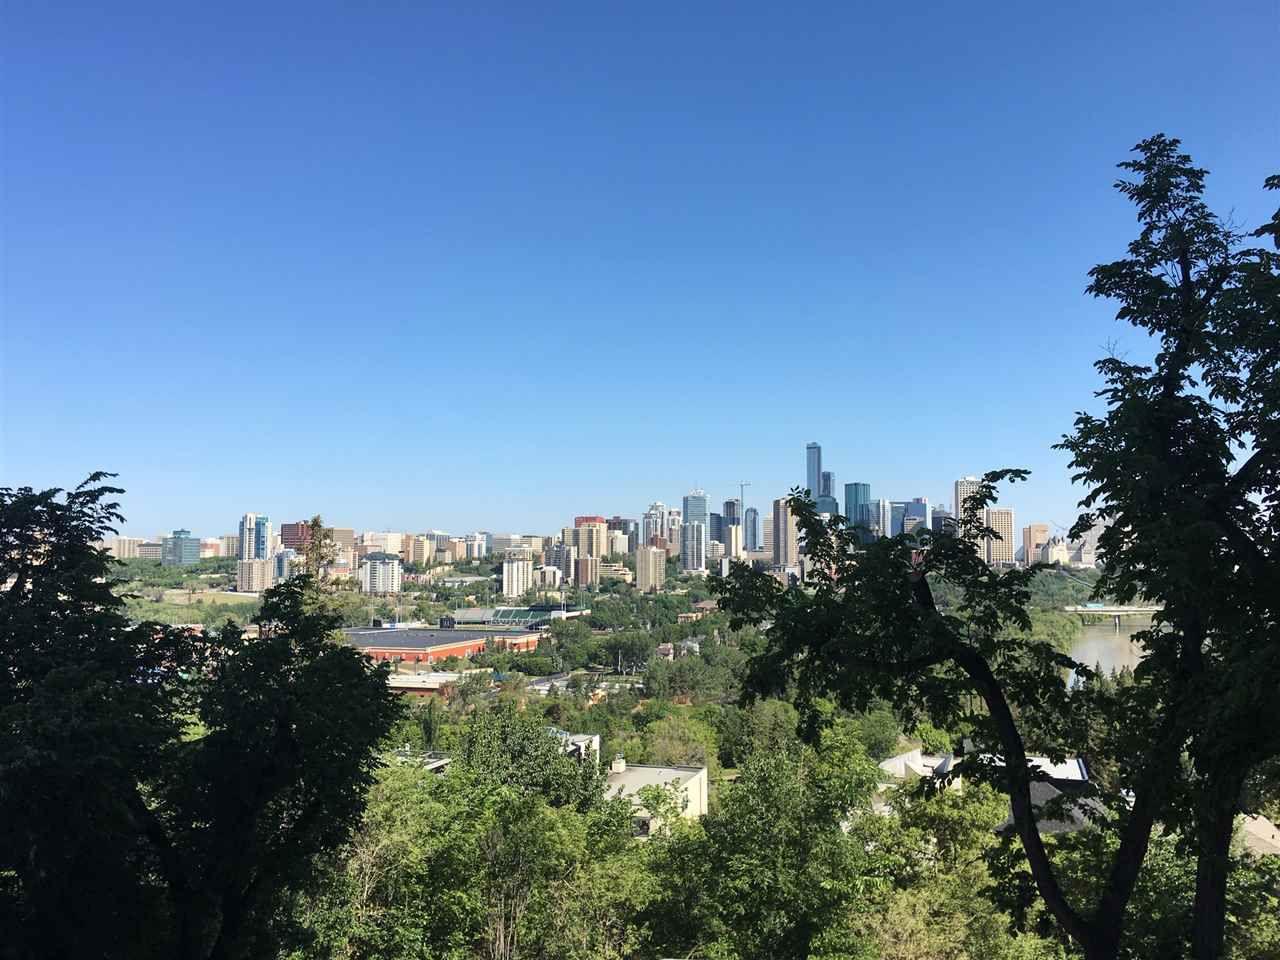 Photo 3: Photos: 401 10035 SASKATCHEWAN Drive in Edmonton: Zone 15 Condo for sale : MLS®# E4147730